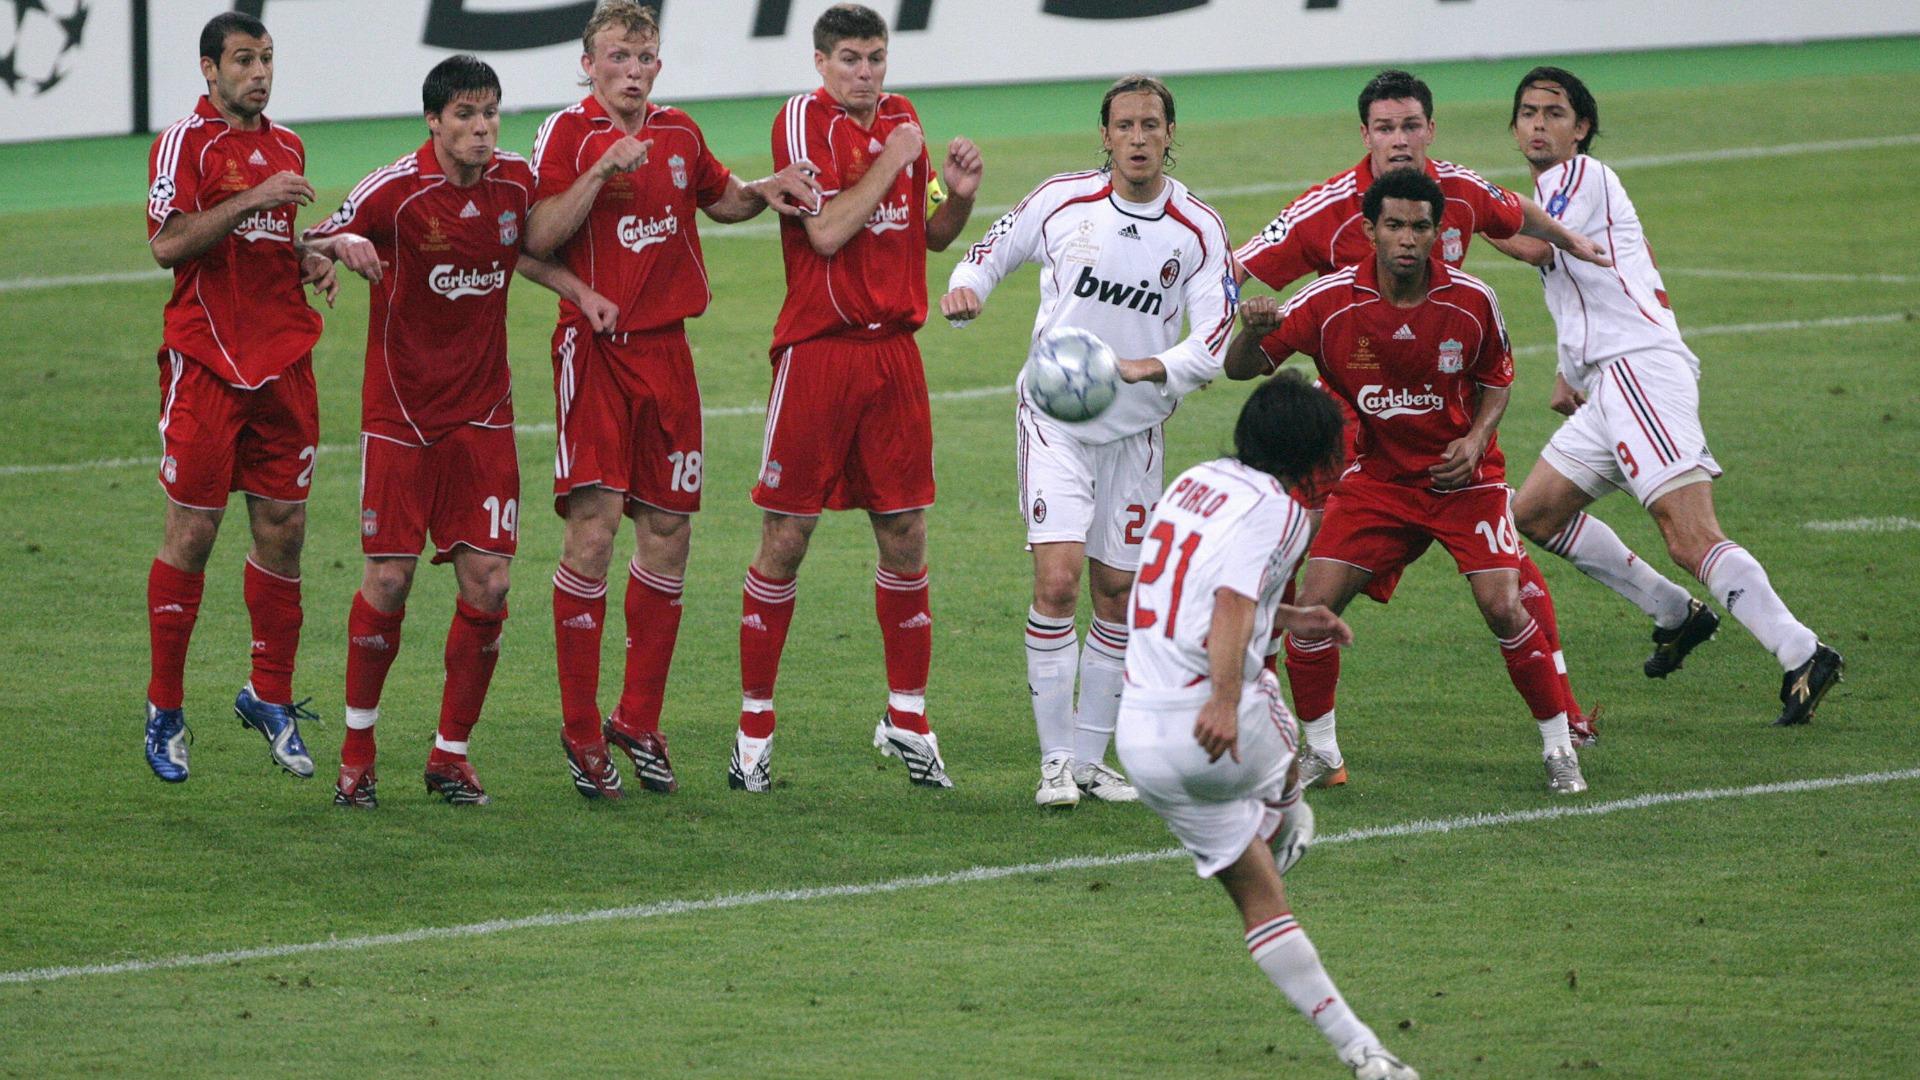 Andrea Pirlo AC Milan Liverpool 2007